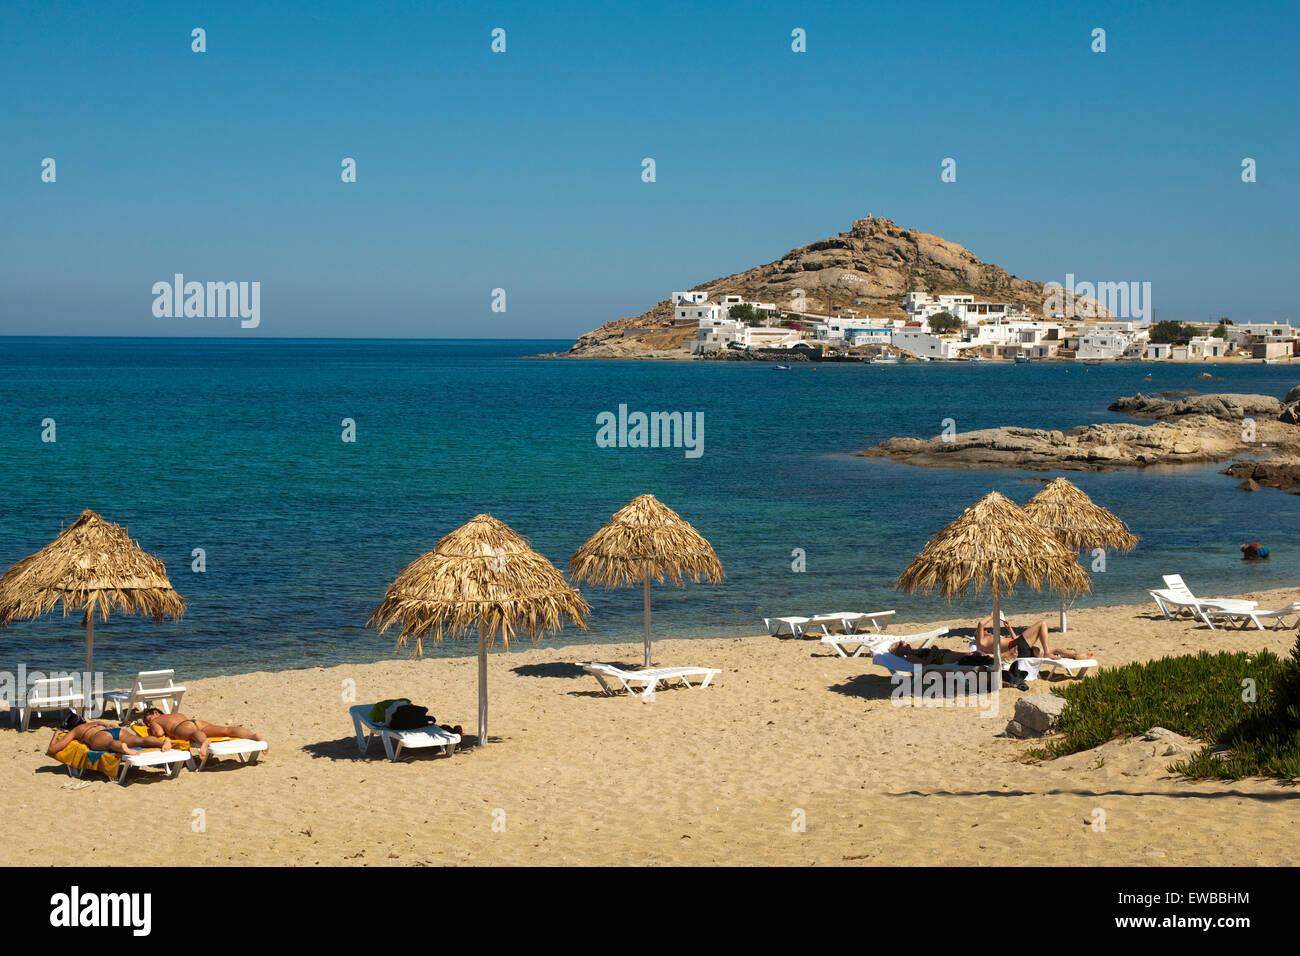 Griechenland, Kykladen, Mykonos, Halbinsel Divounia und Kalafati Strand Stock Photo